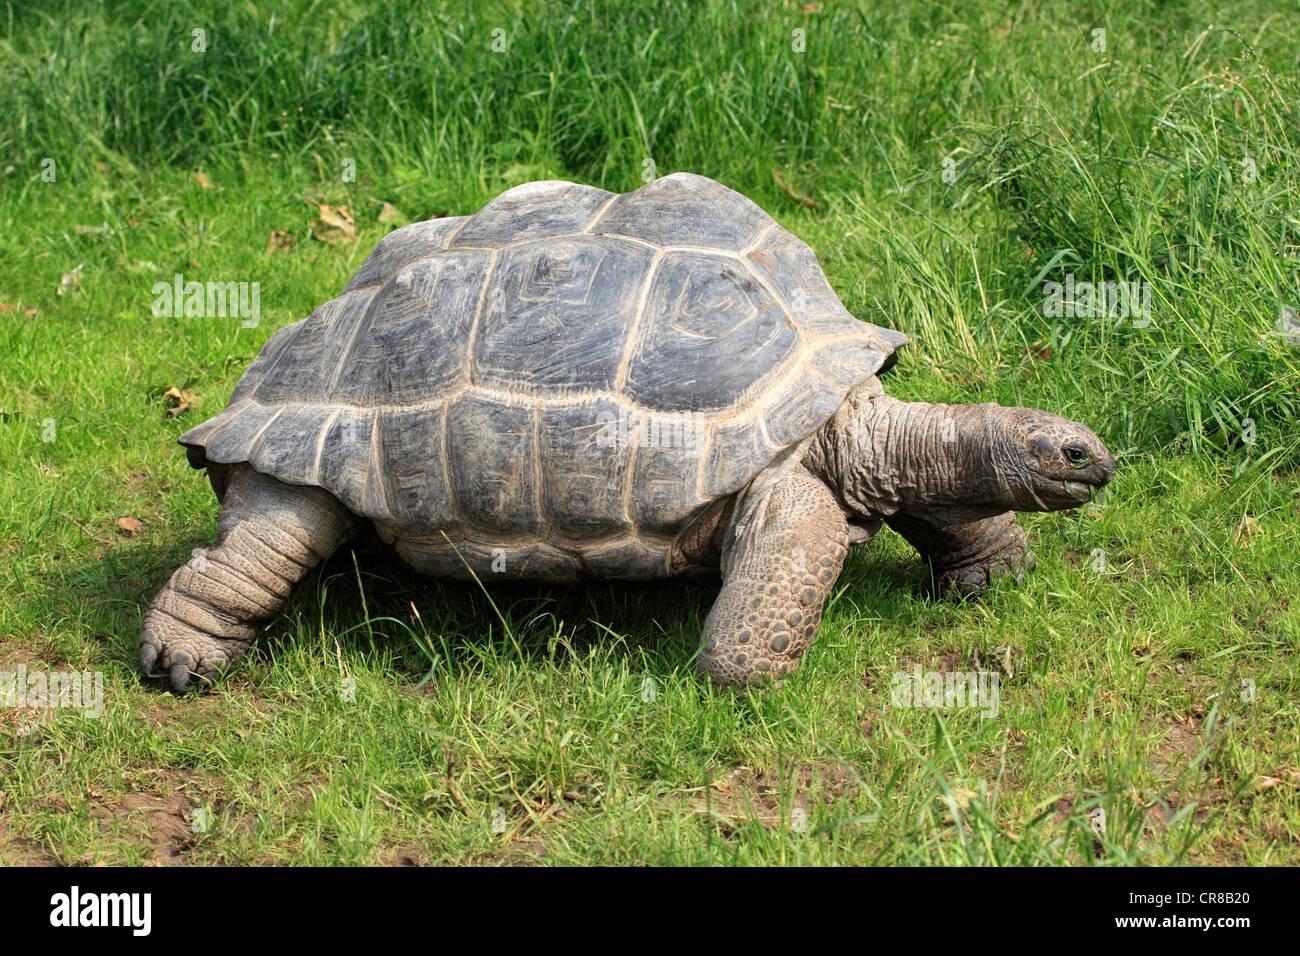 Aldabra giant tortoise (Testudo gigantea, Geochelone gigantea), foraging - Stock Image